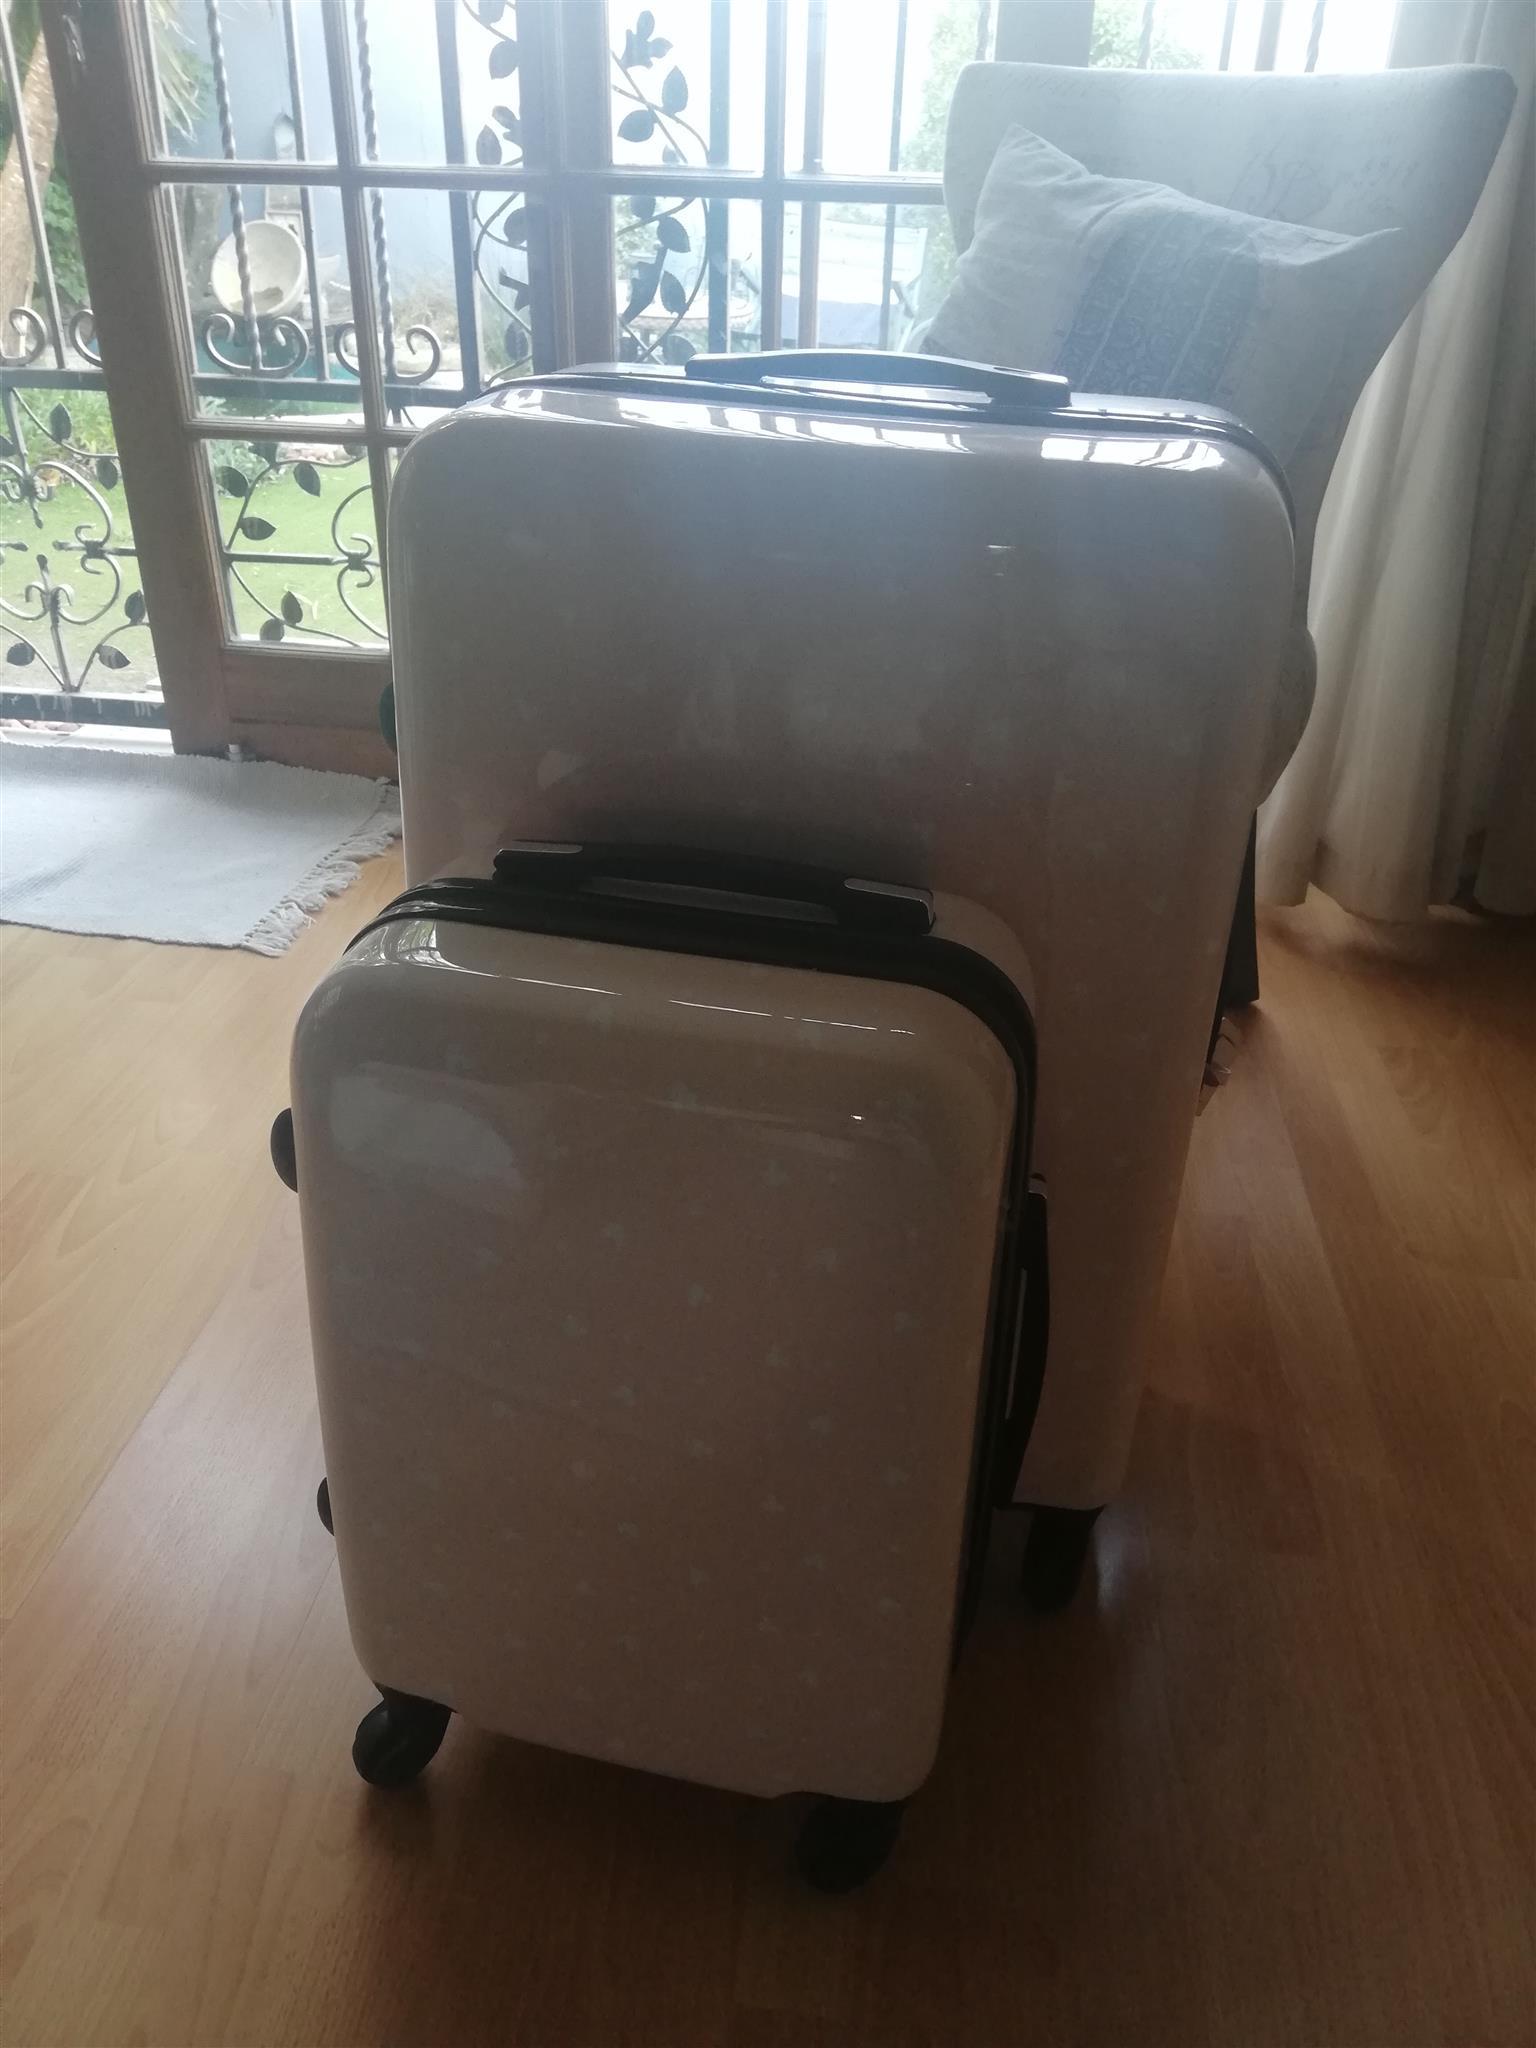 Set of 2 Typo luggage bags